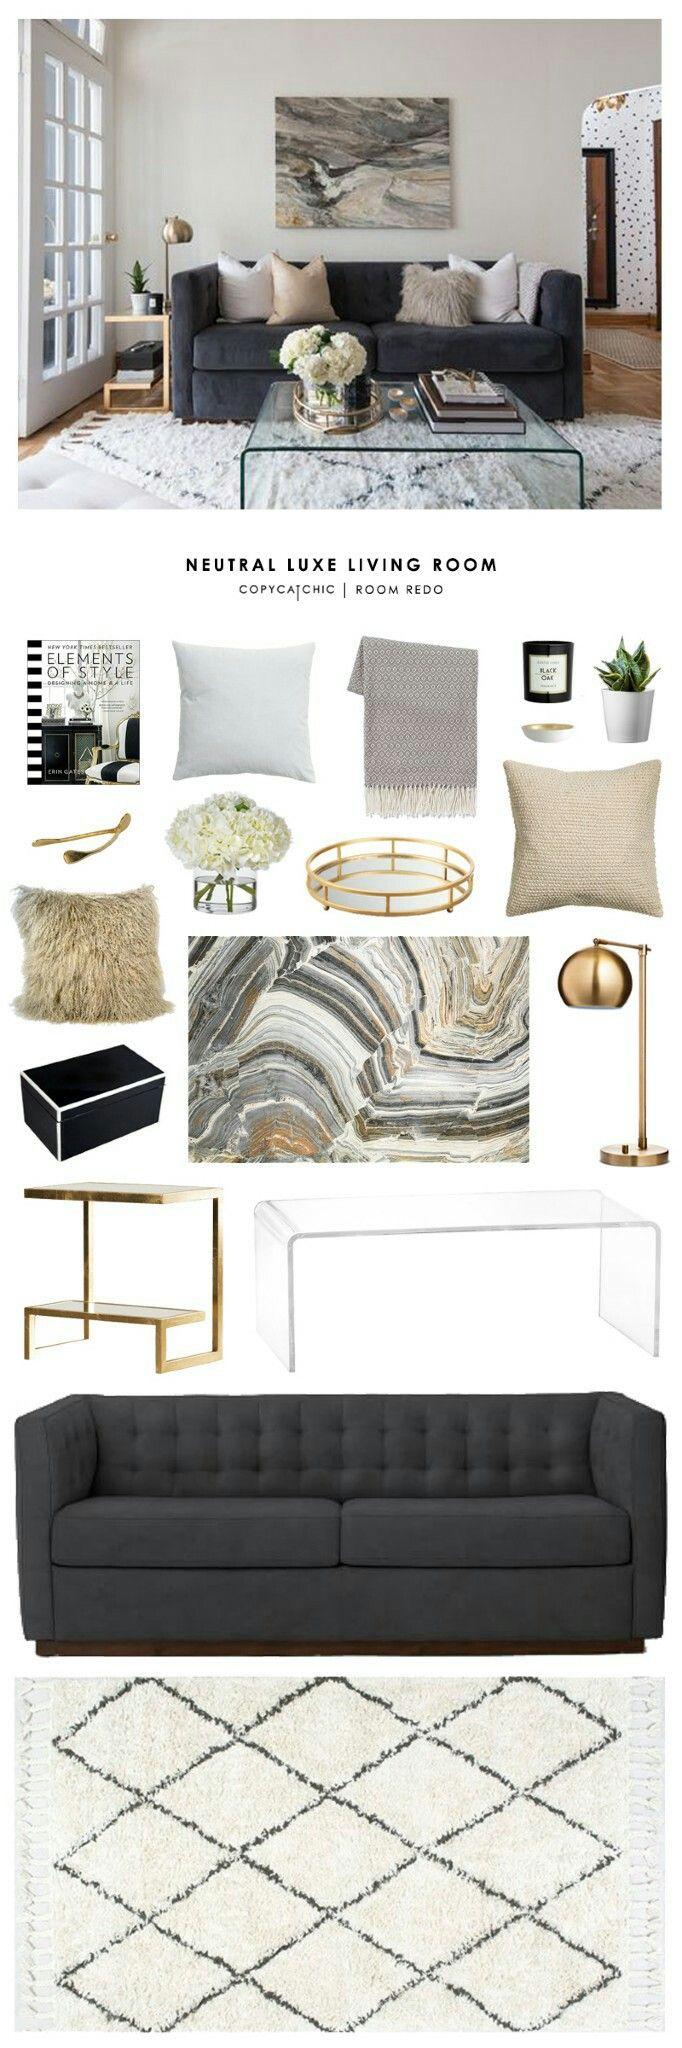 best lash studio ideas images on pinterest living room corner